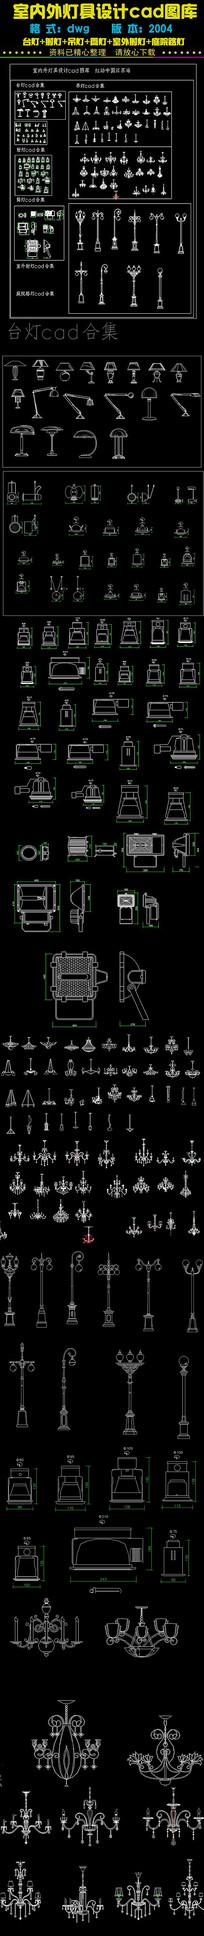 室内外灯具设计cad图库 dwg